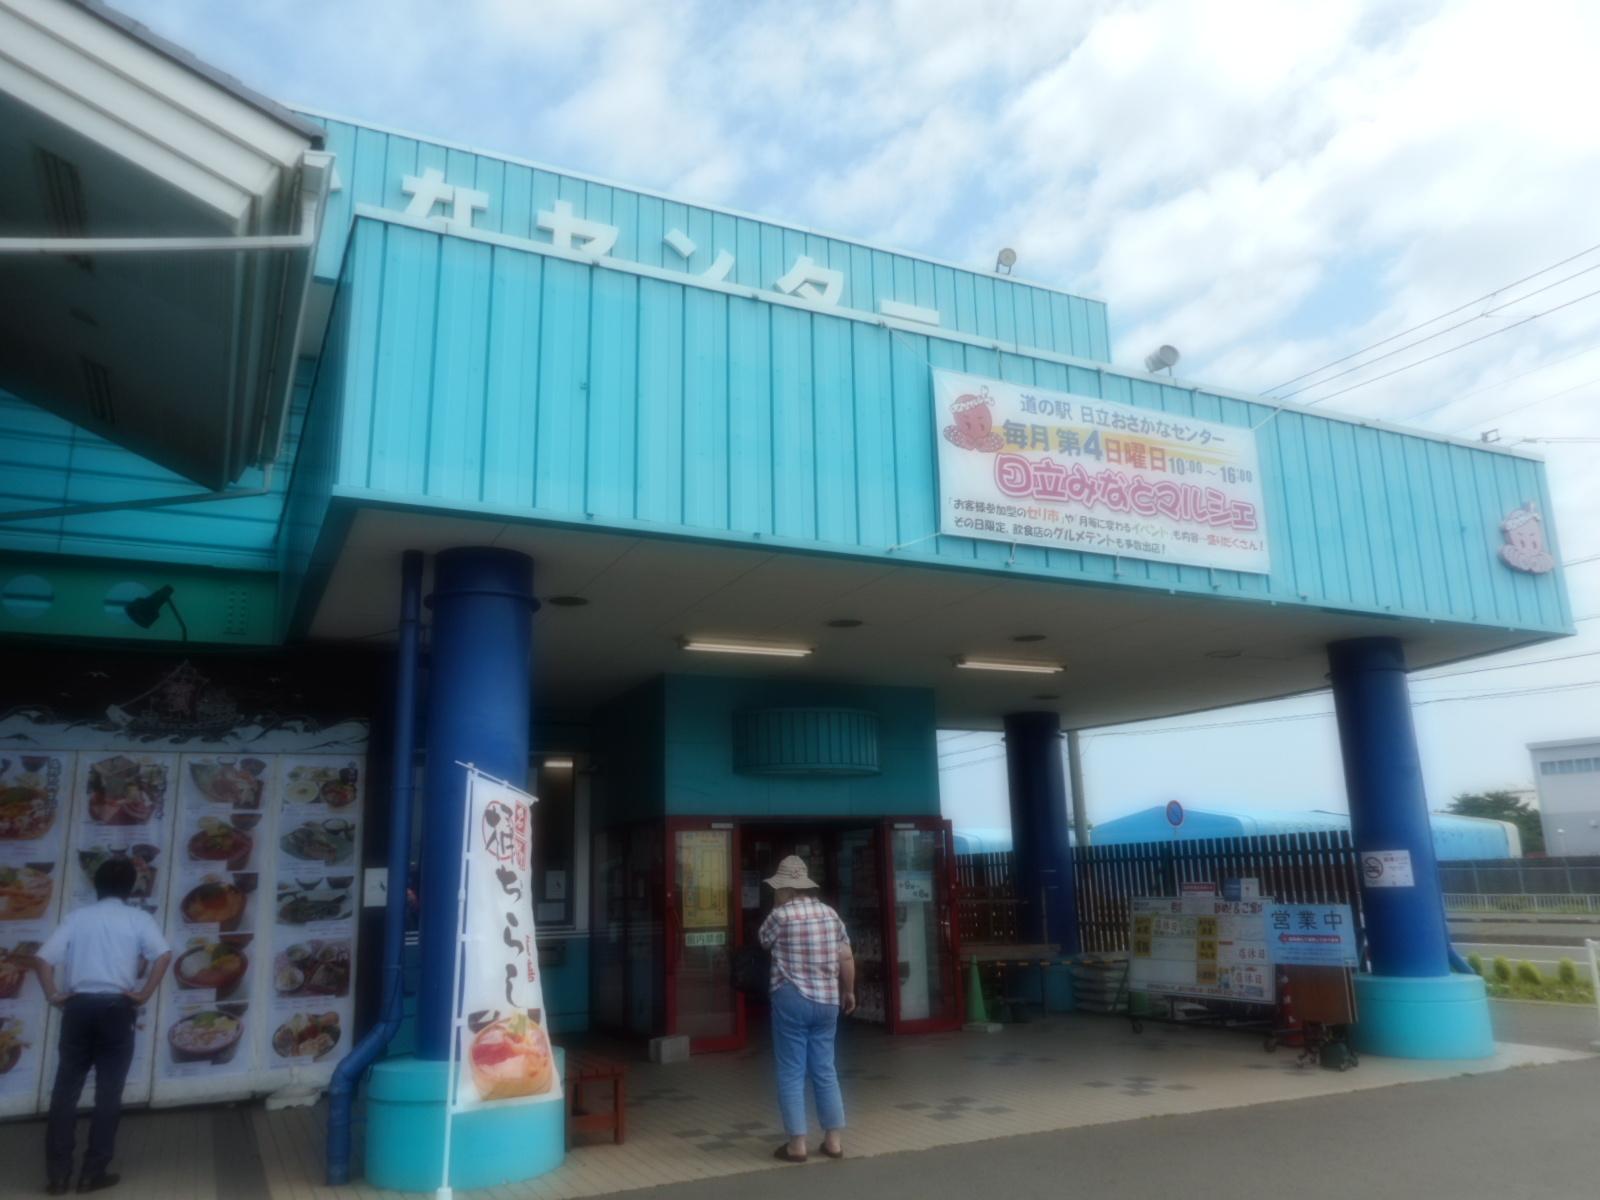 茨城県 日立漁港へ_b0203588_17041631.jpg